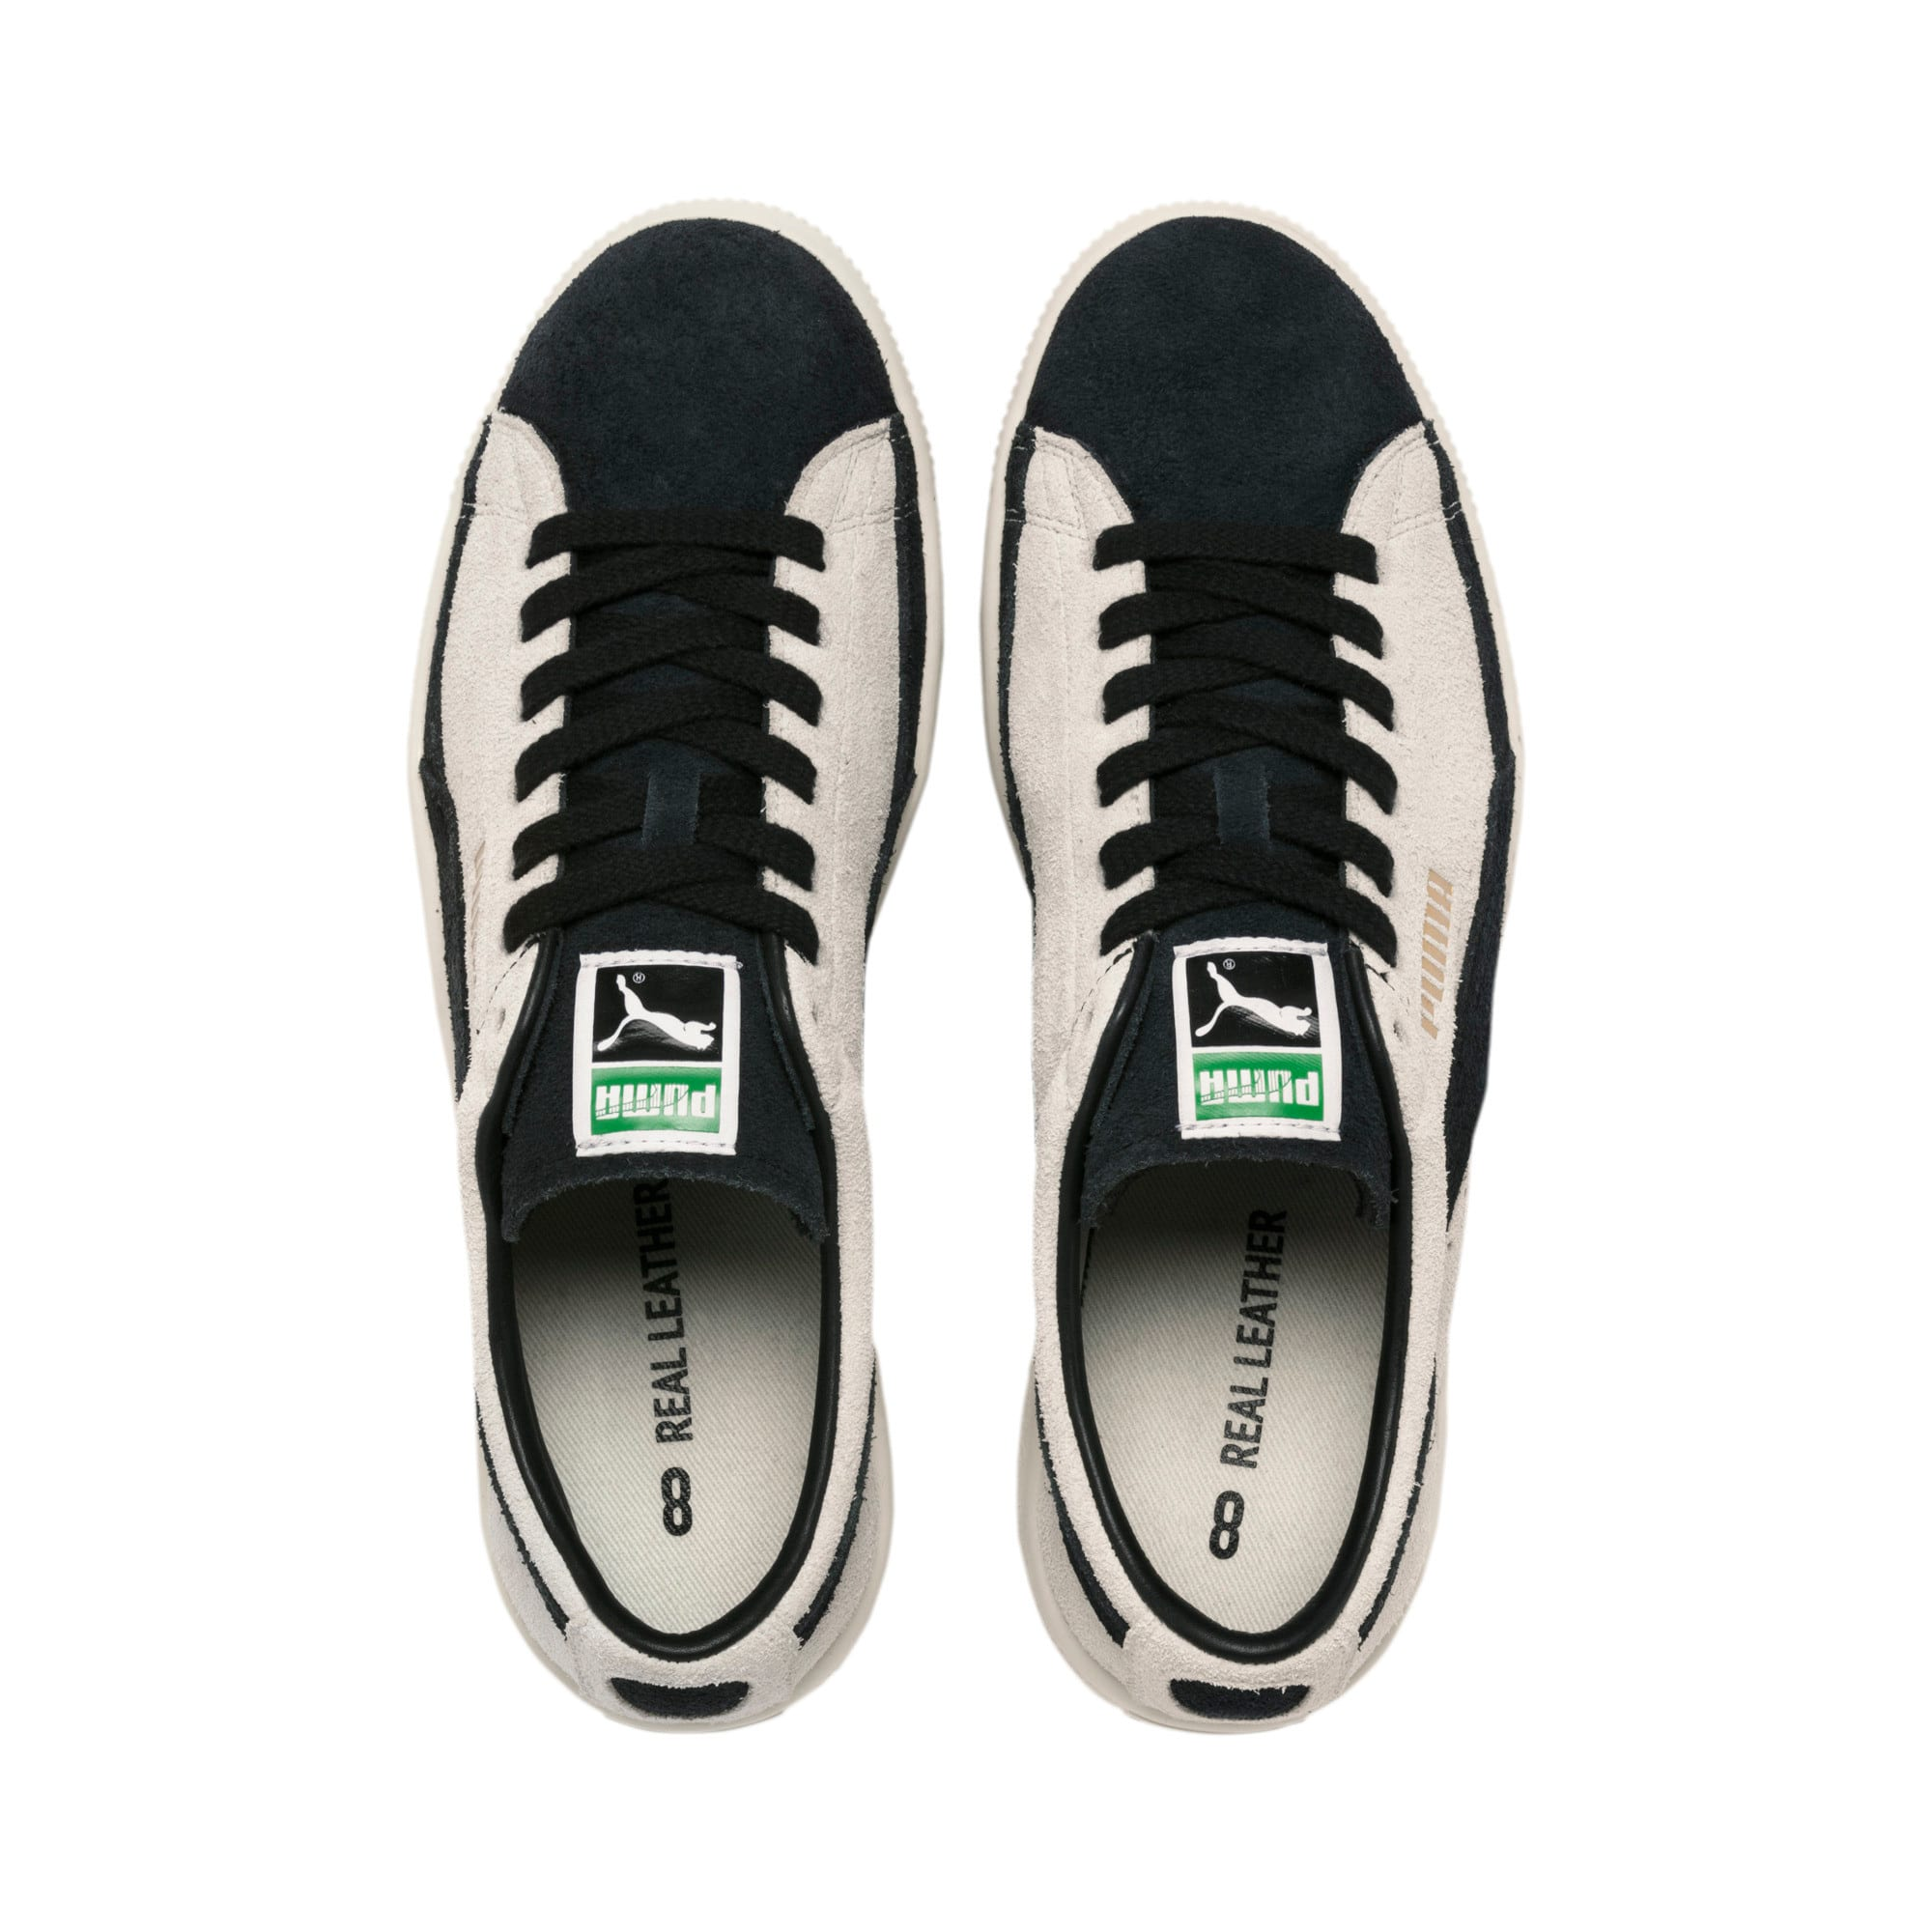 Thumbnail 7 of Suede 90681 Vintage Sneakers, Whisper White-Puma Black, medium